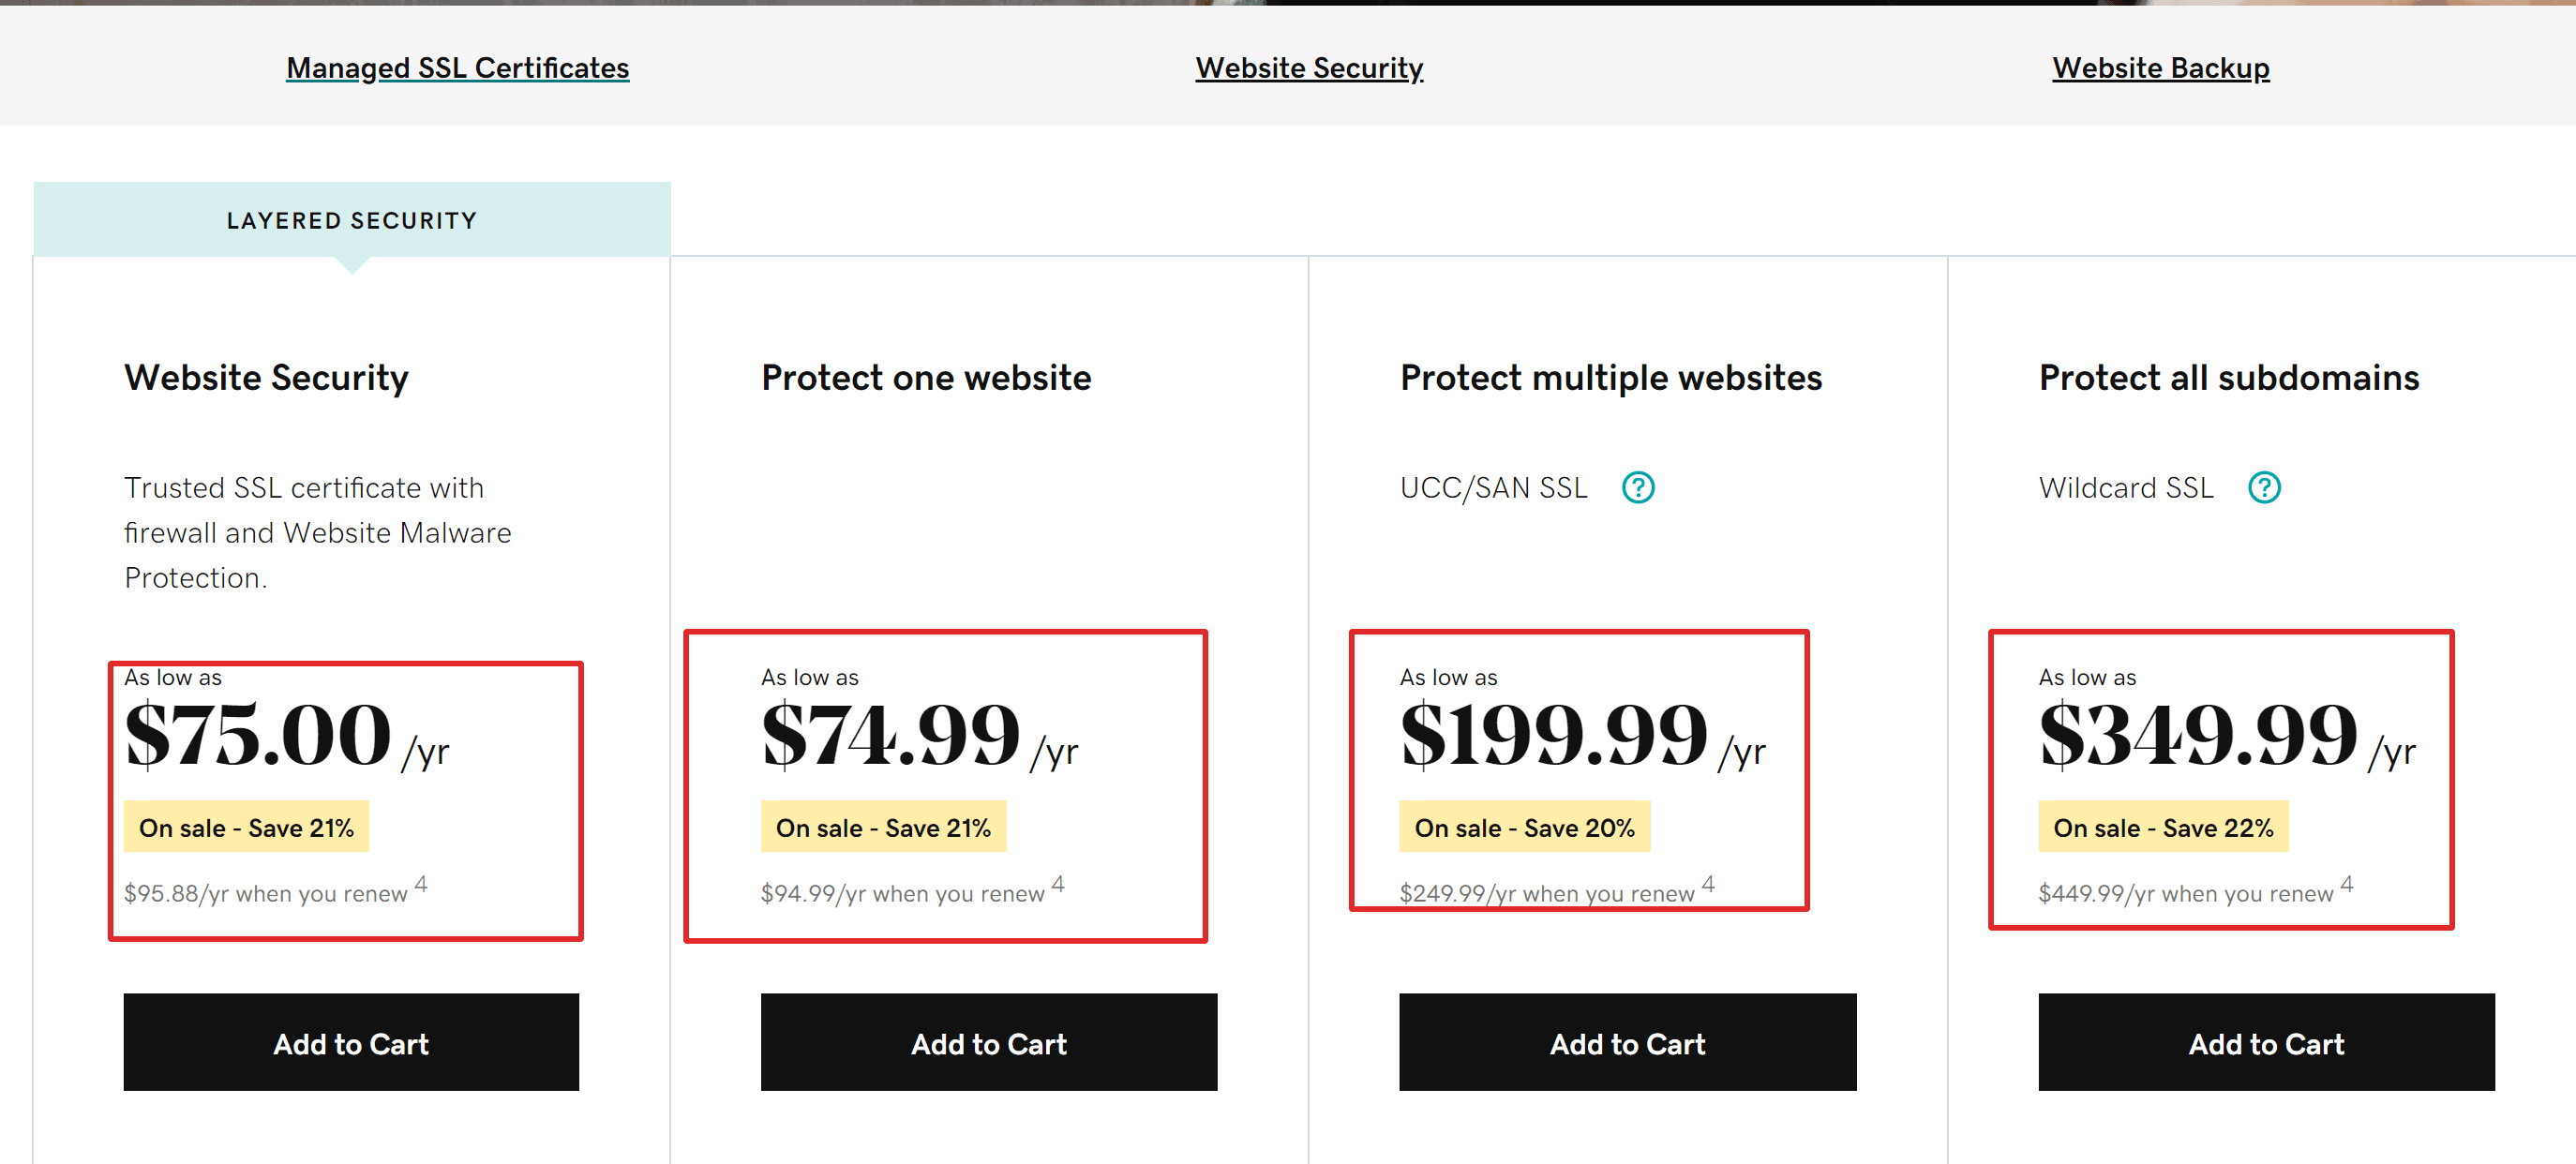 Godaddy SSL offers